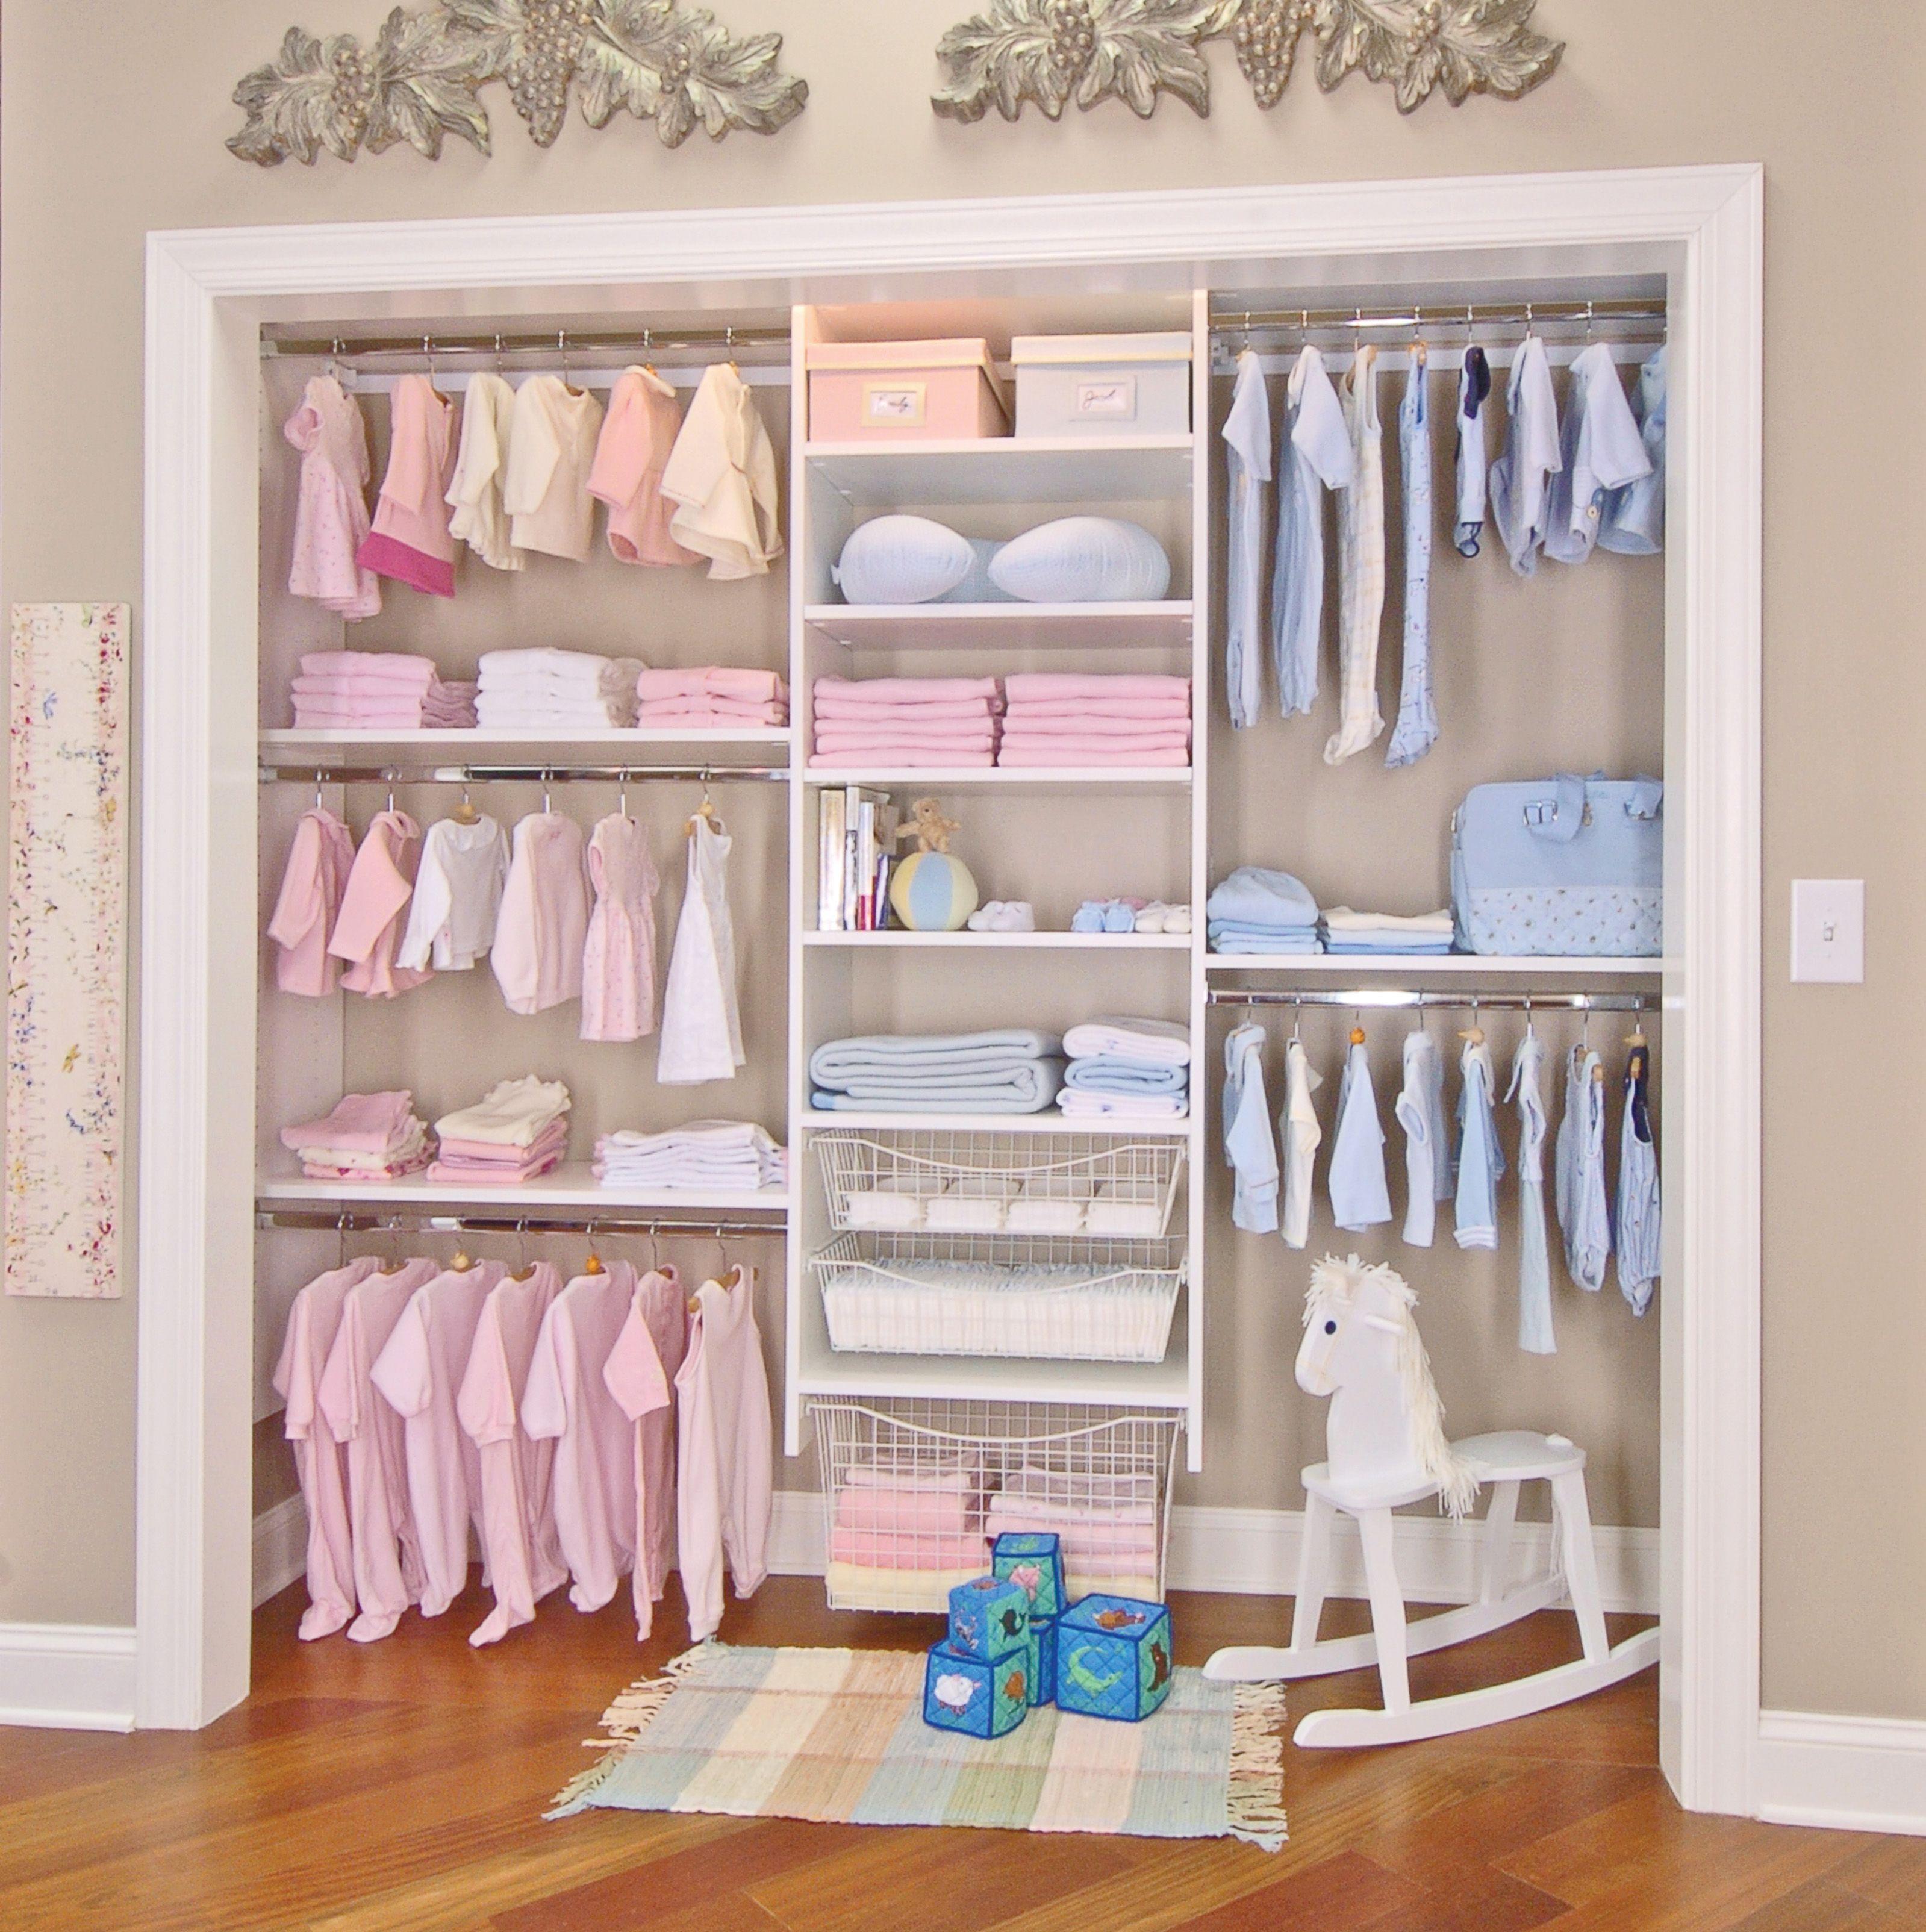 Pin De Fernanda Macedo En Baby Nursery Ideas Pinterest  # Muebles Vestidores Para Bebes